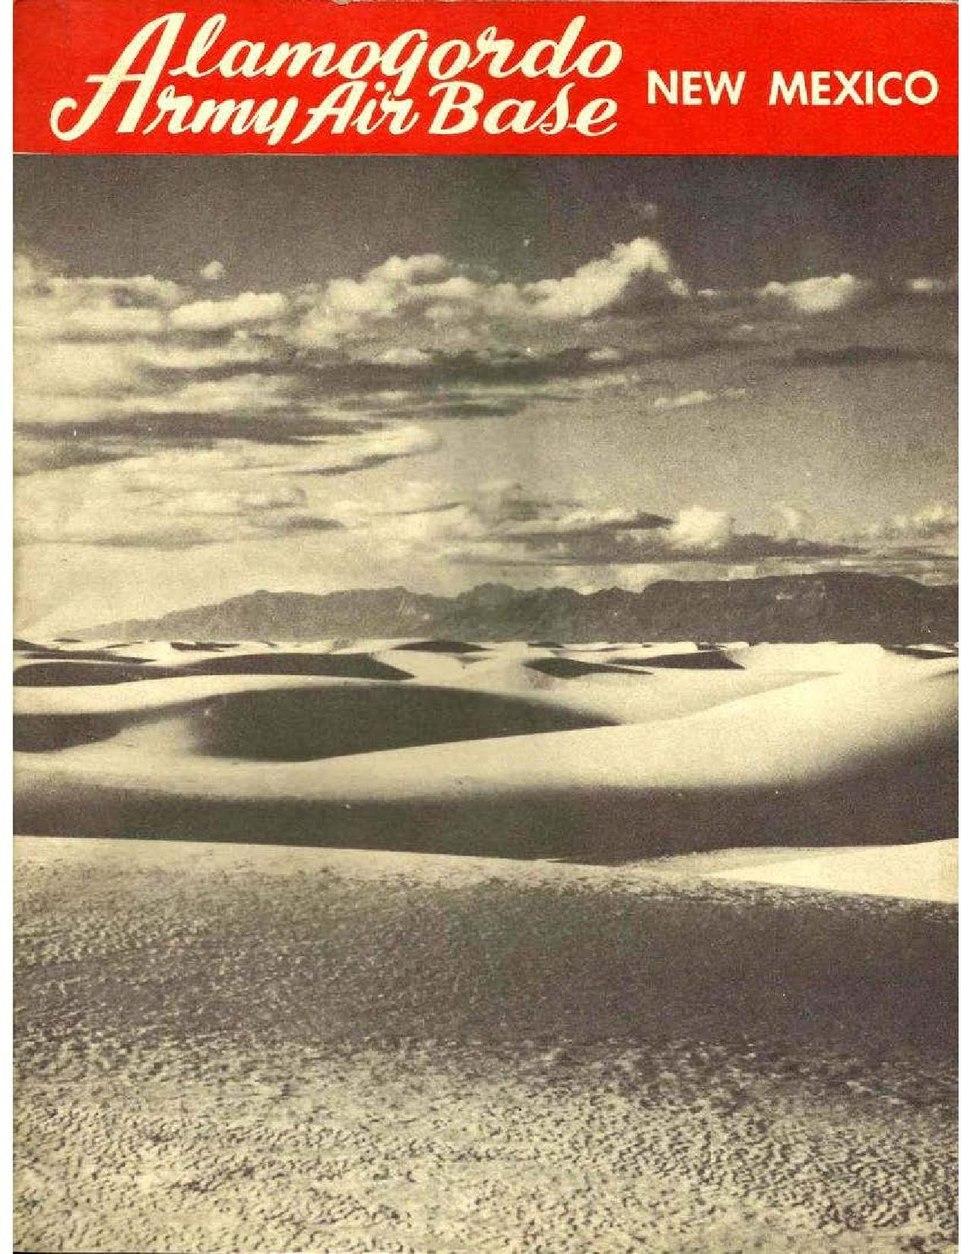 Alamogordo Army Airfield New Mexico photo pictorial.pdf